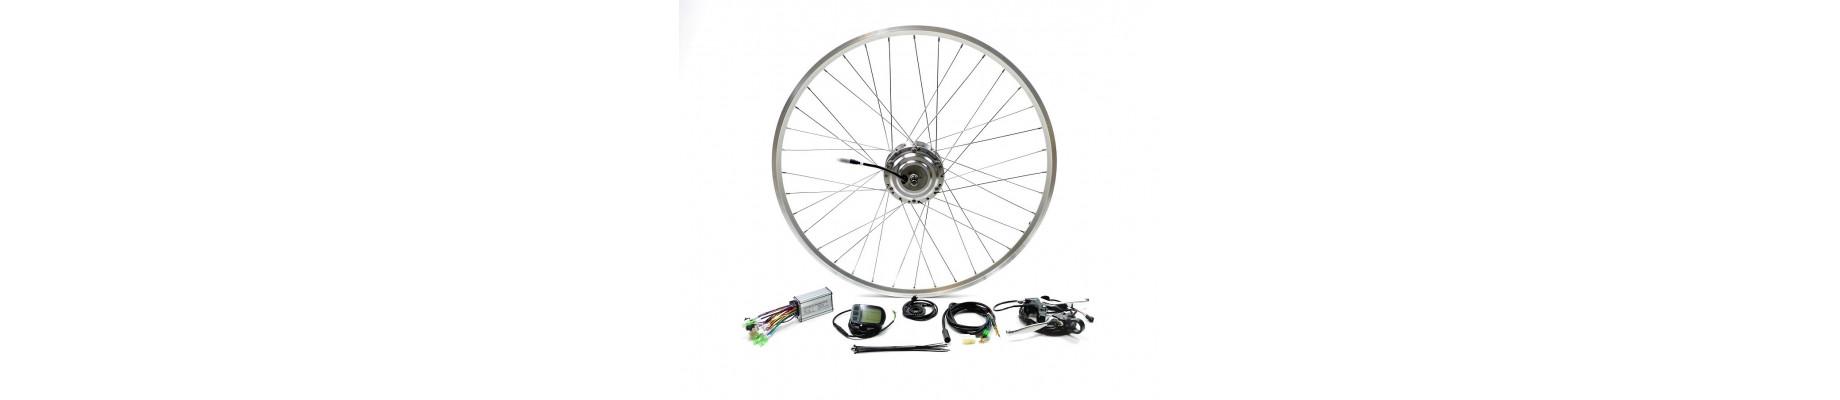 Alm. cykel (250 watt)